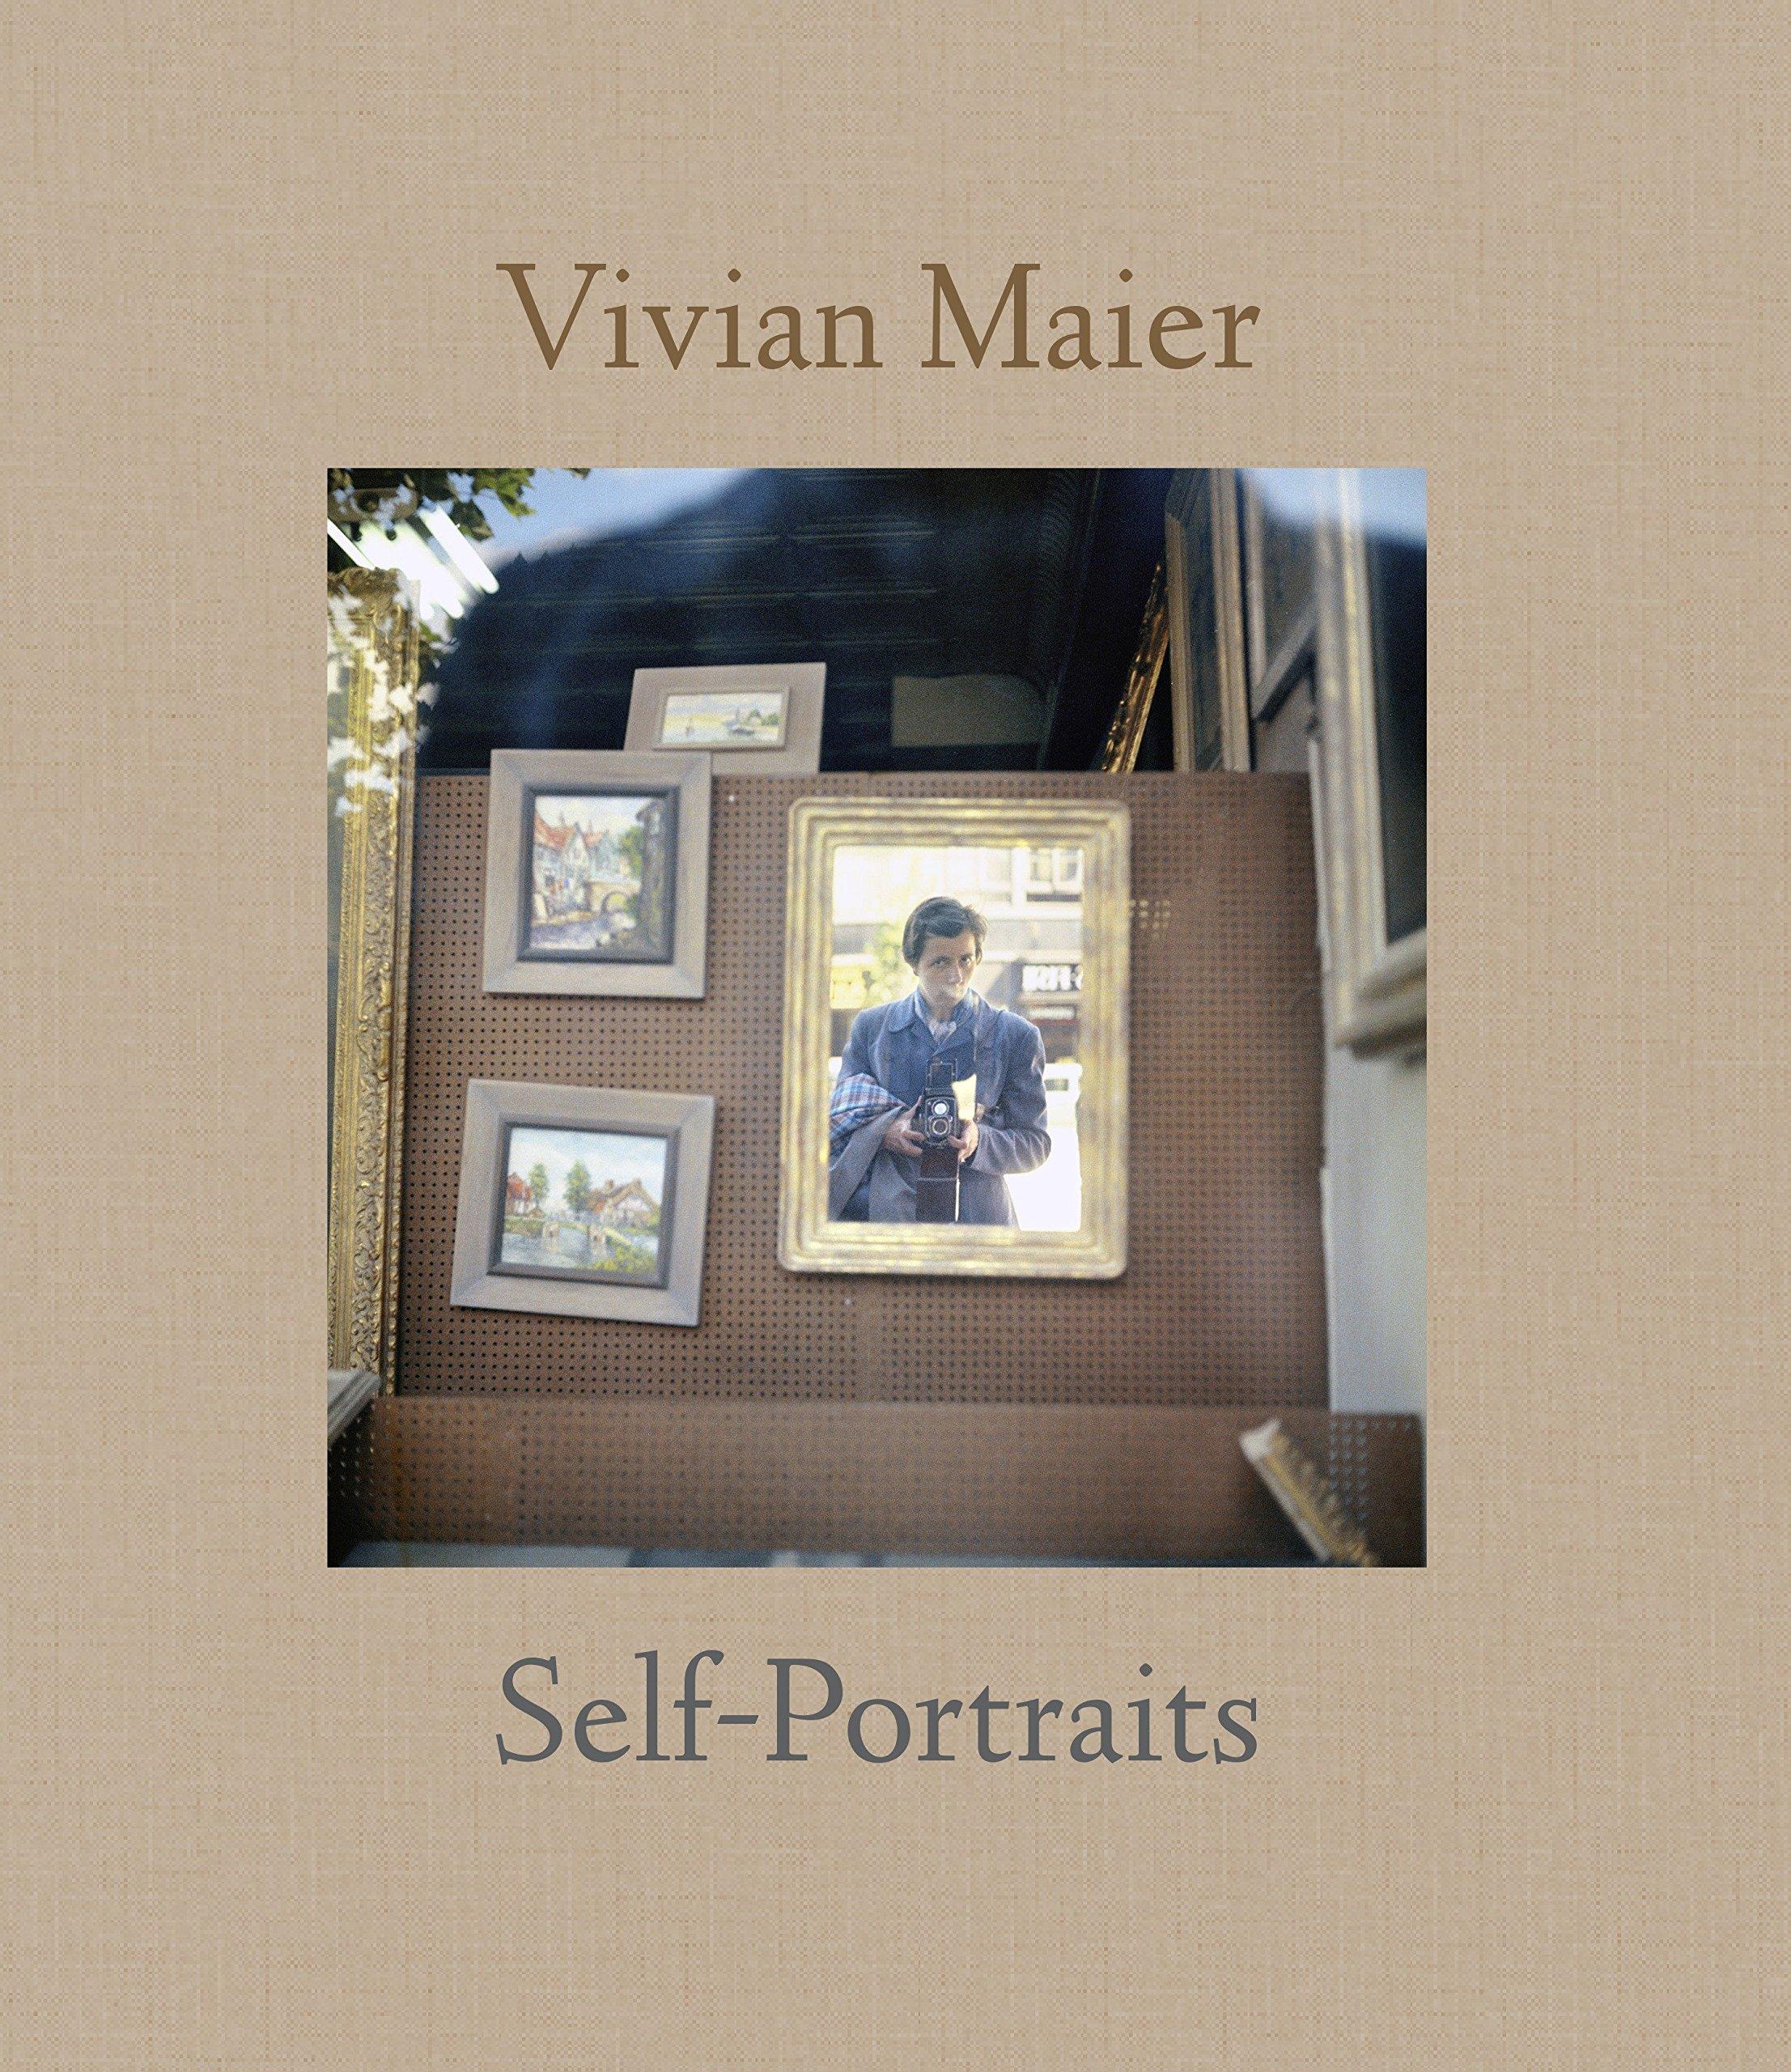 Vivian Maier: Self-Portraits